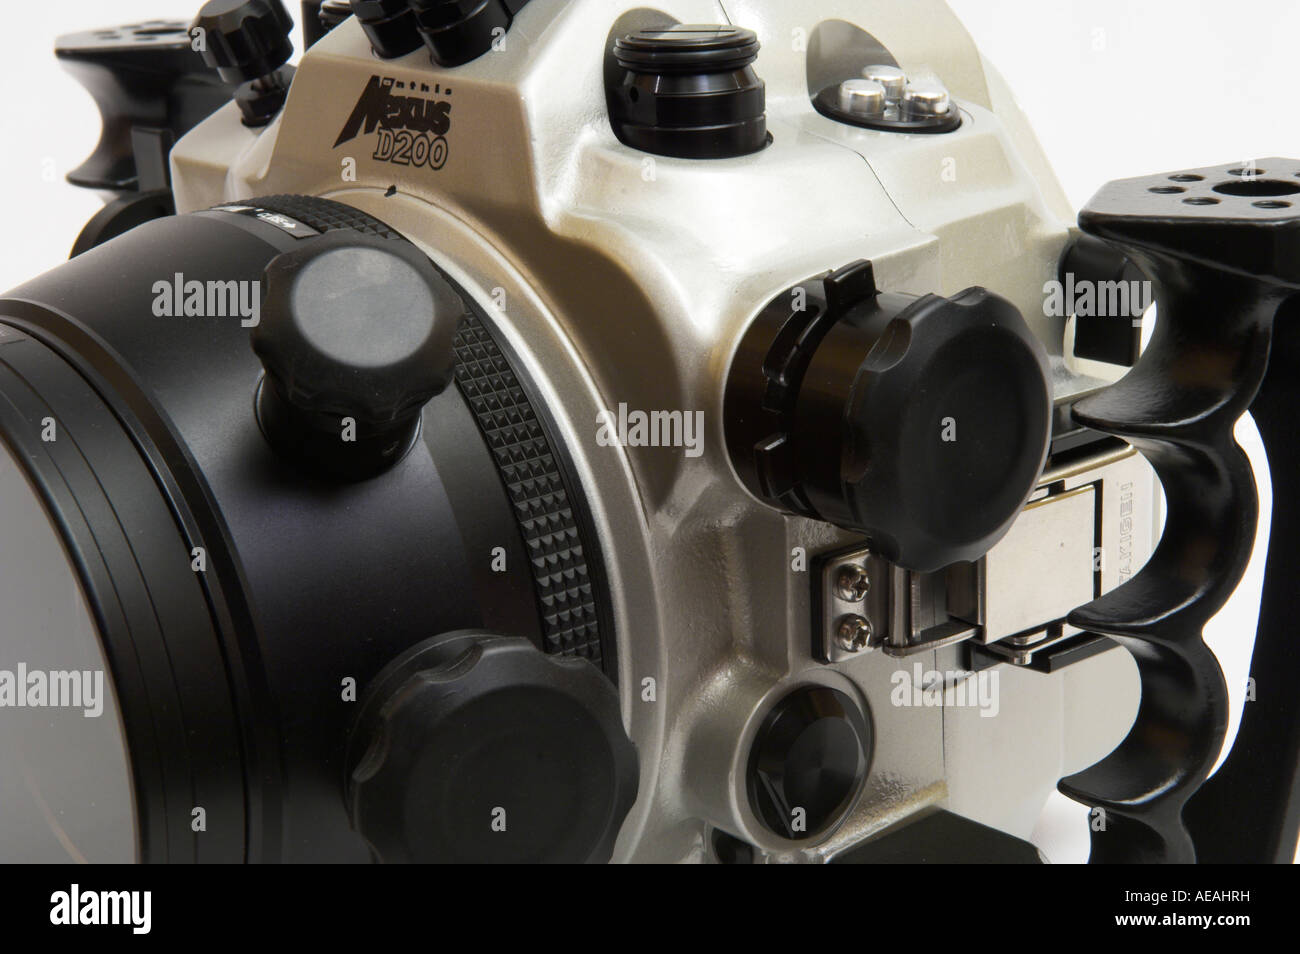 Closeup side view Nexus D200 underwater camera housing for Nikon with macro port - Stock Image